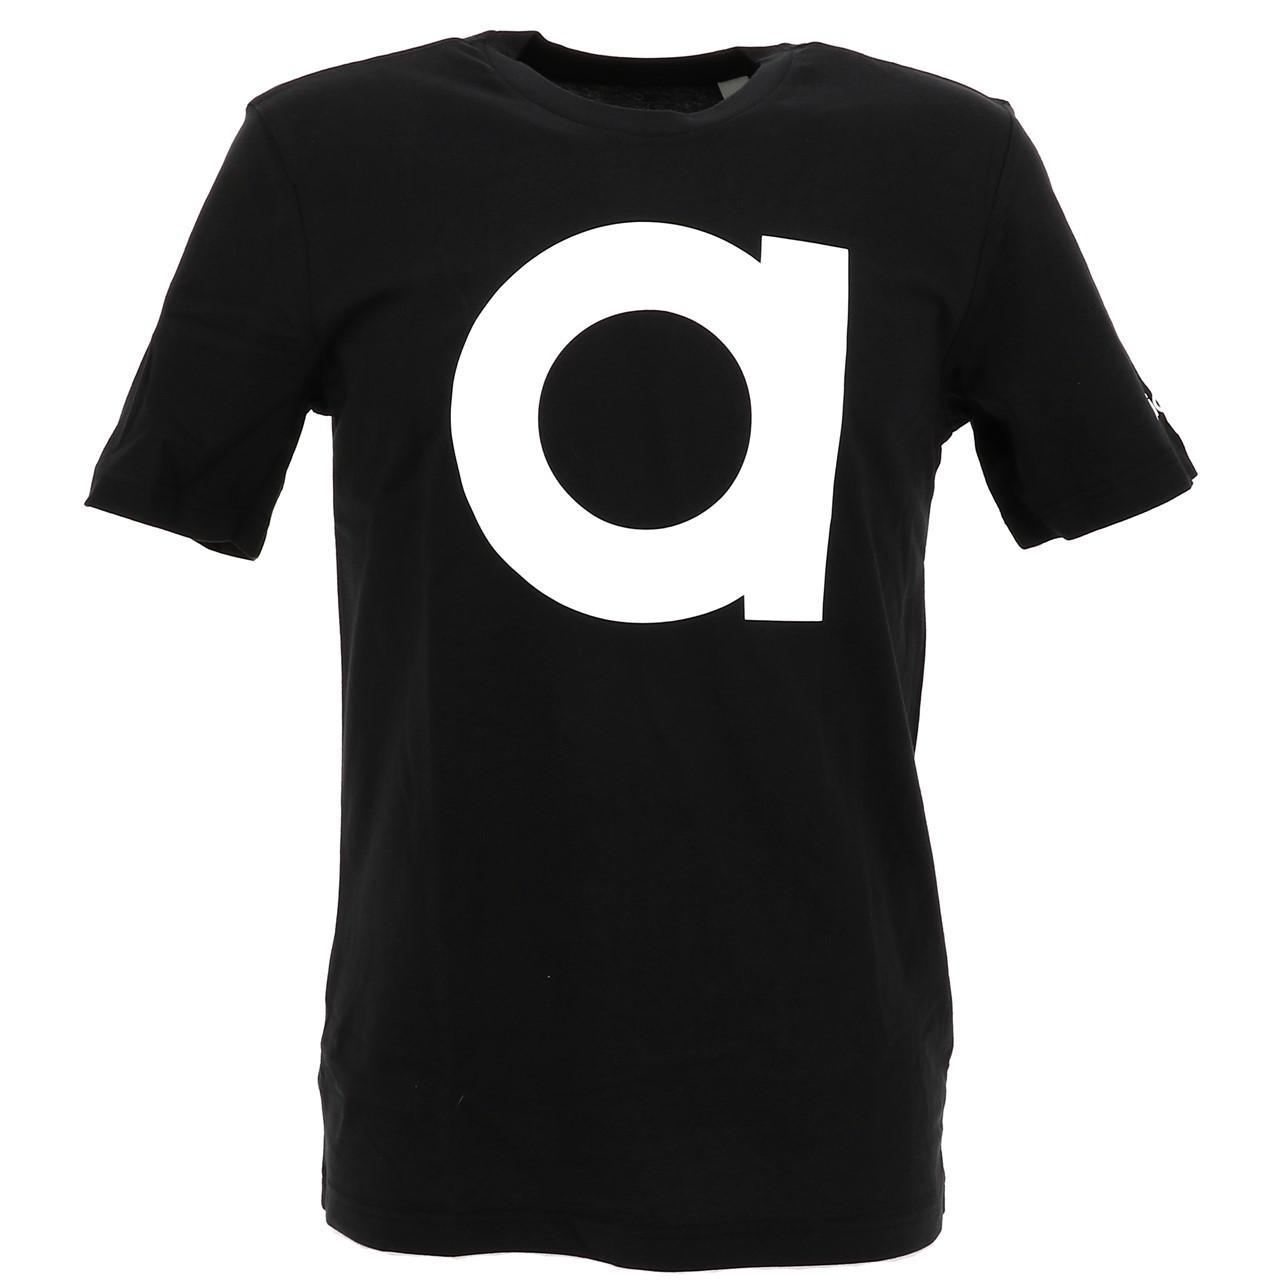 Short-Adidas-Brand-Black-Mc-Tee-Black-18283-New